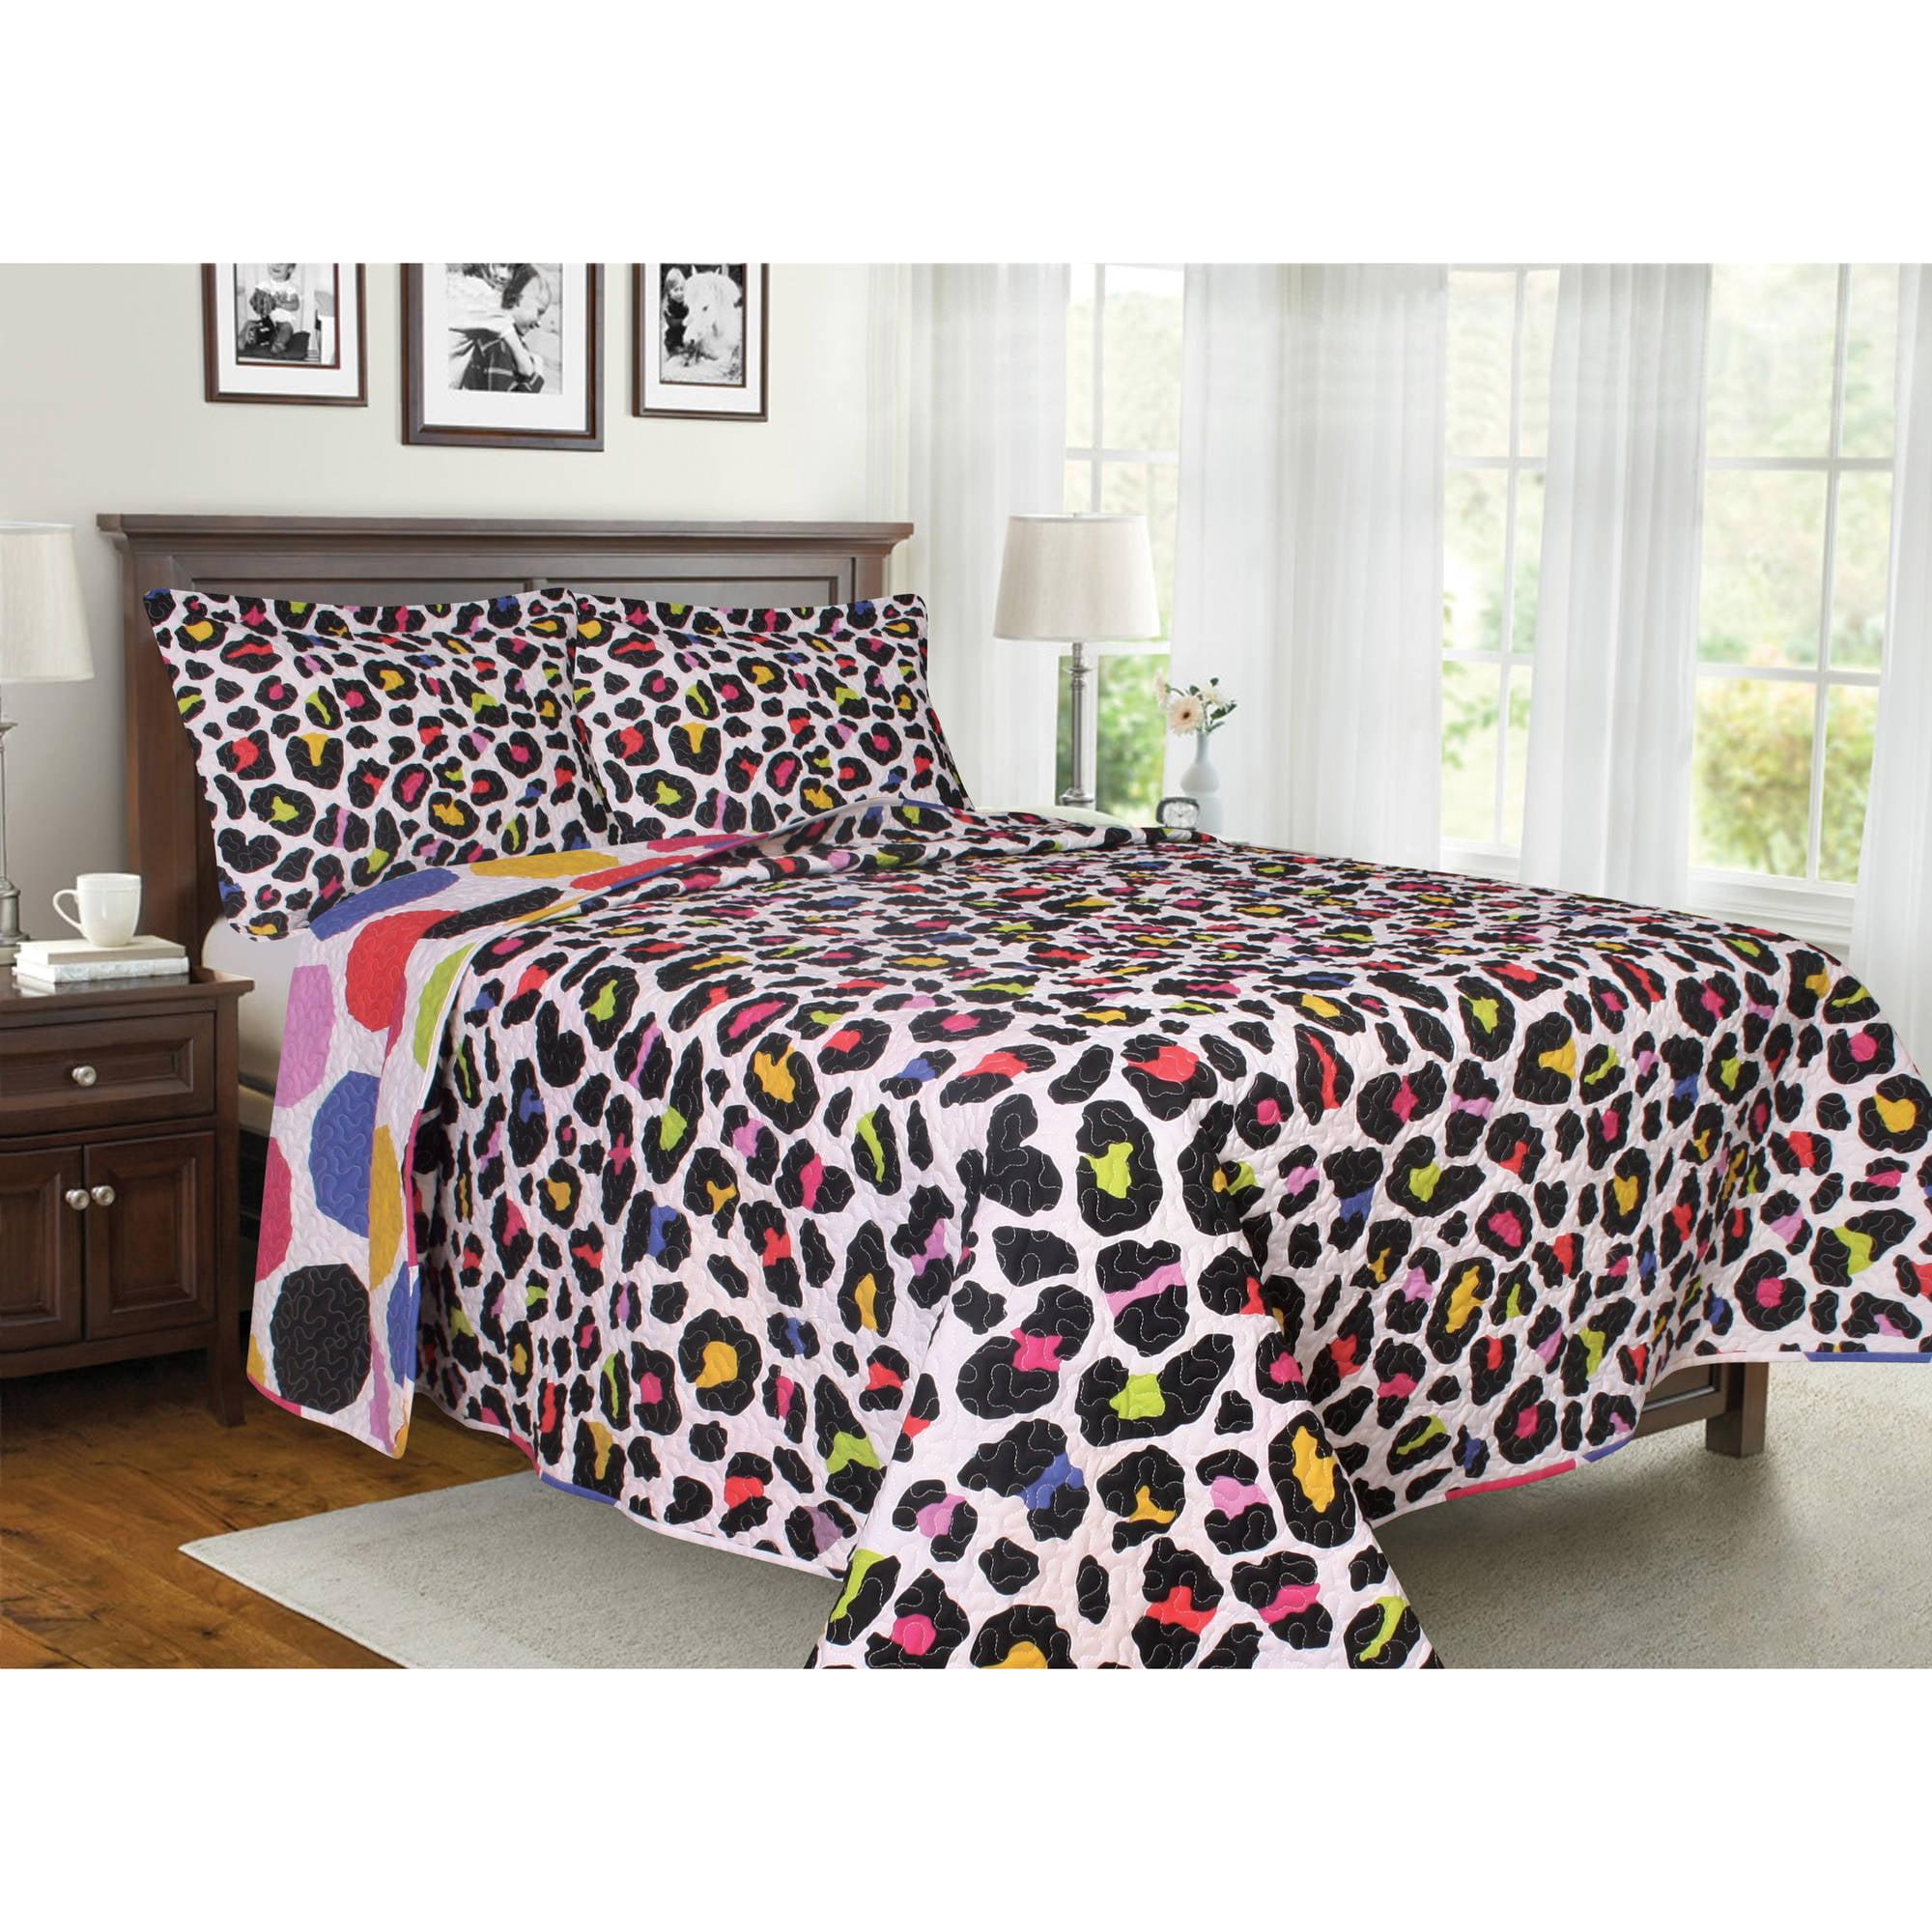 Animal Soft and Cozy Microfiber Bedding Quilt Set